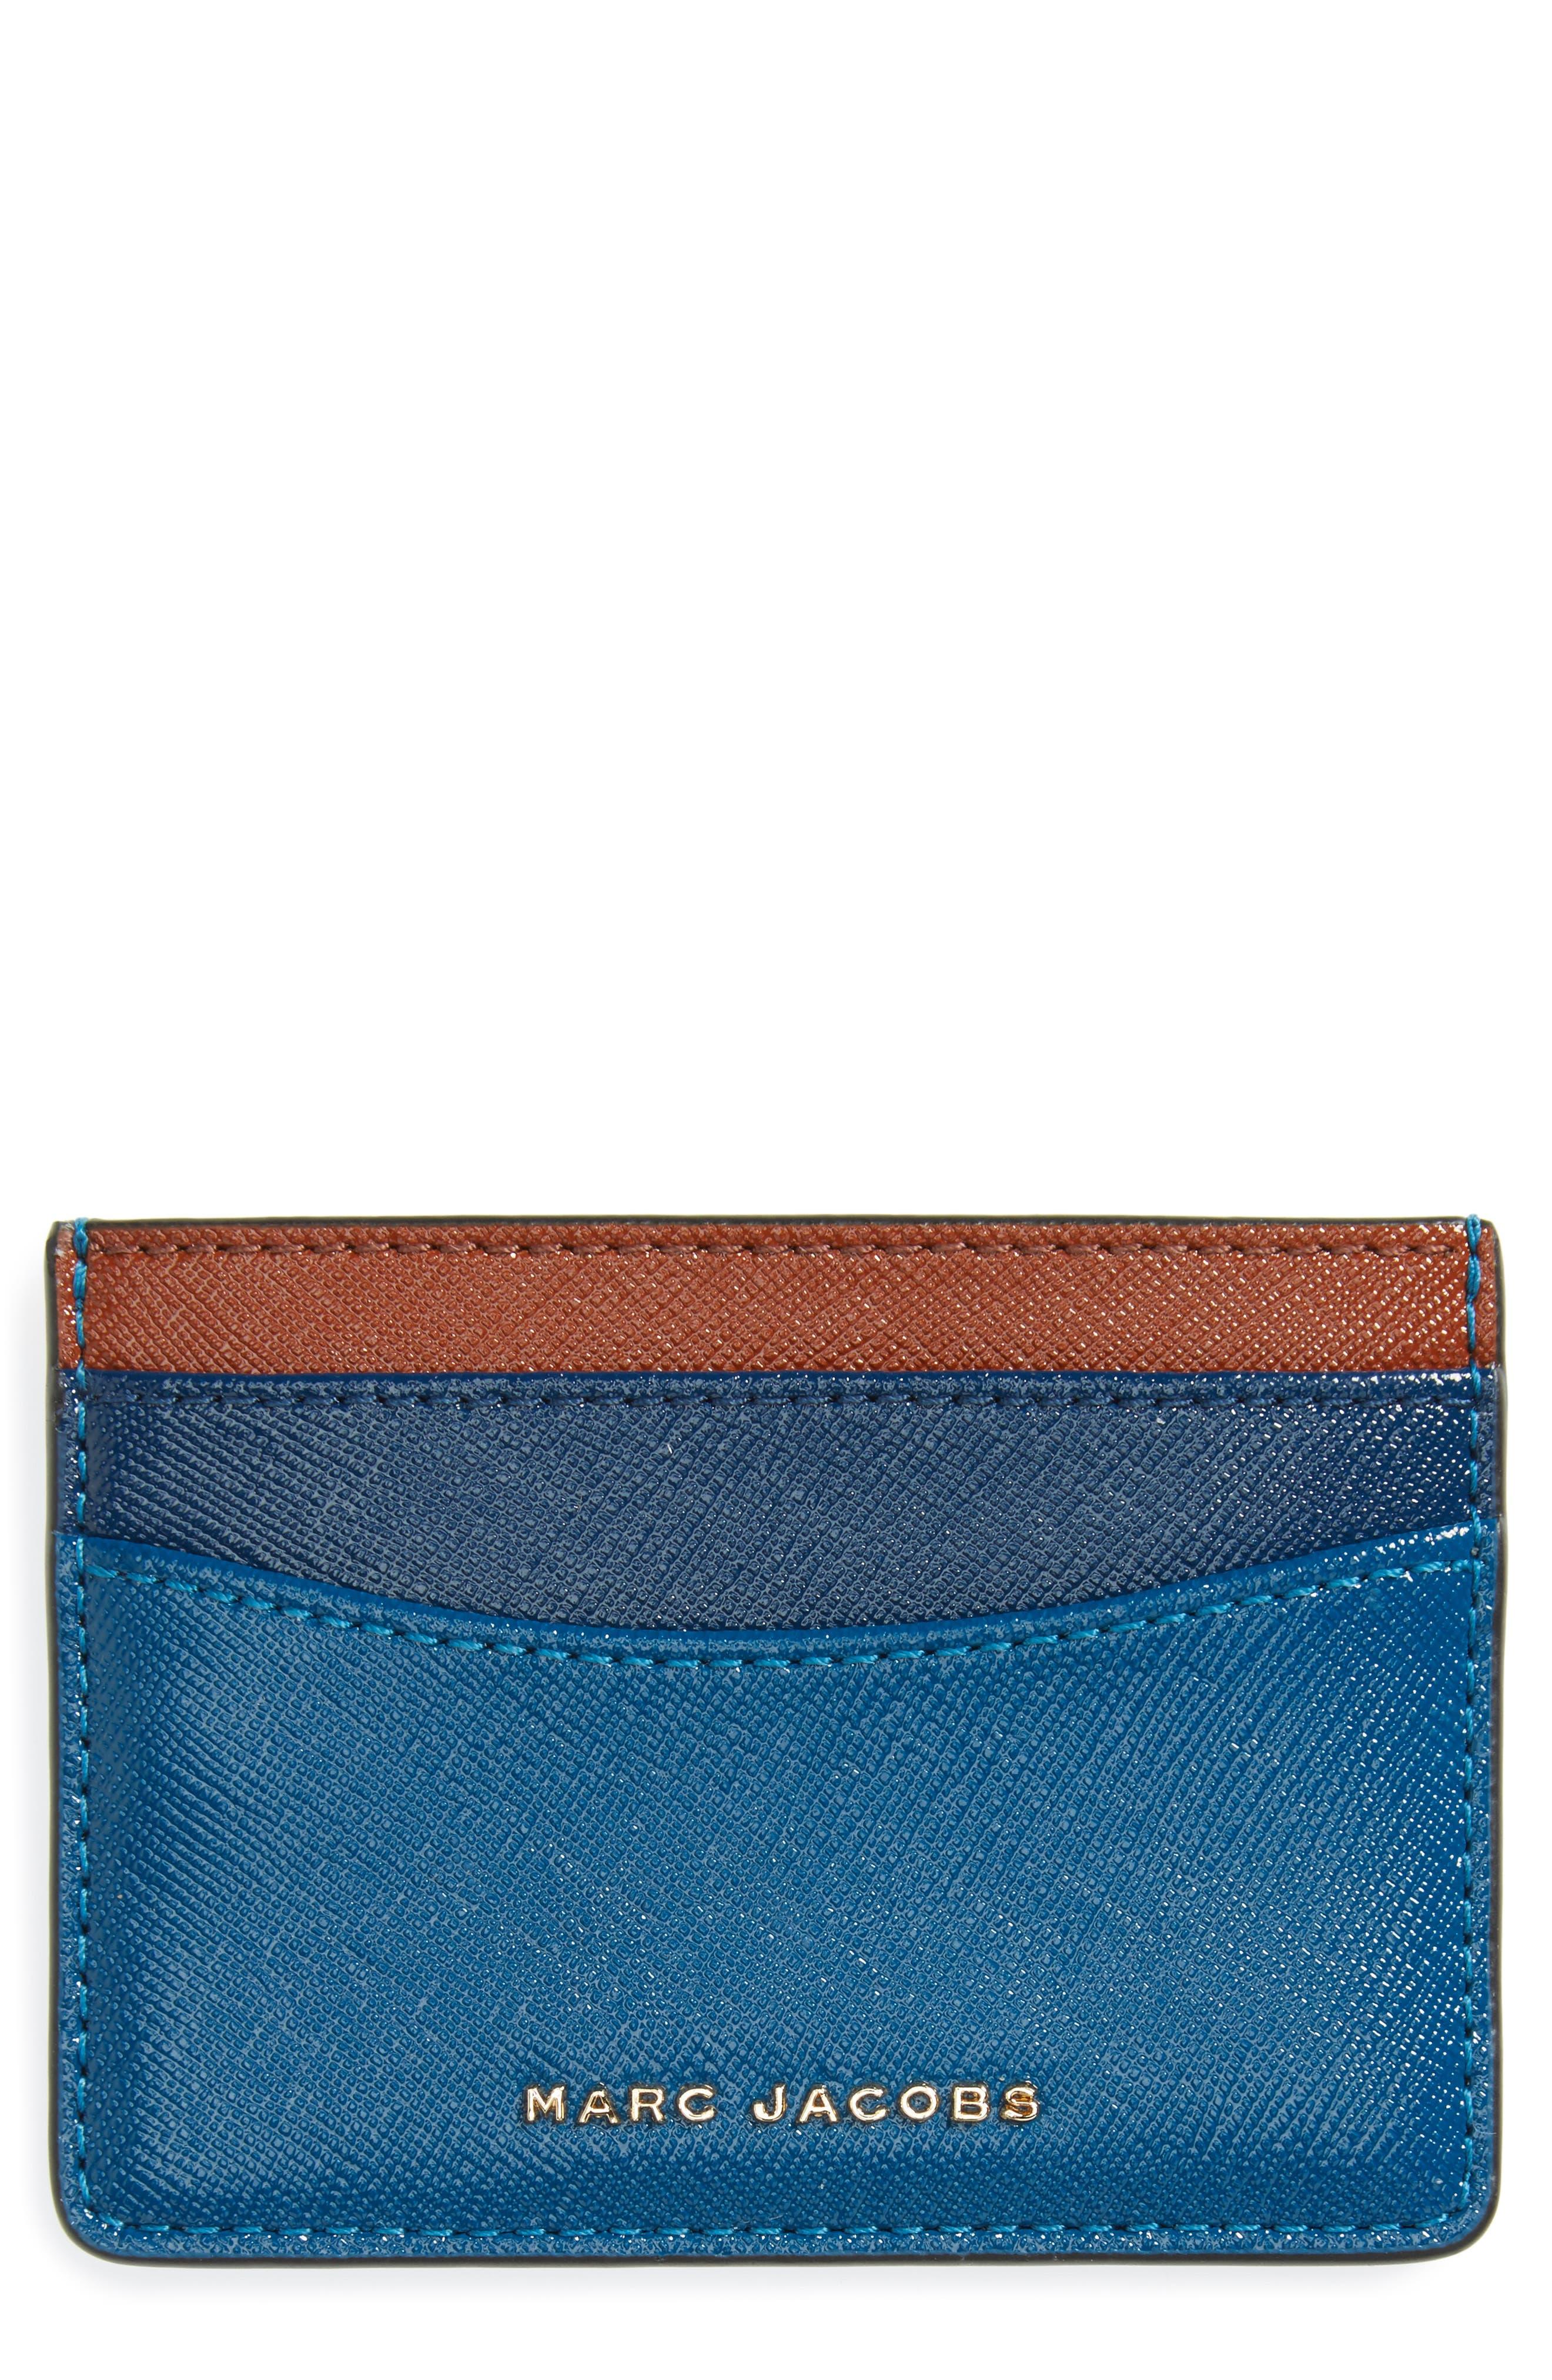 Color Block Saffiano Leather Card Case,                             Main thumbnail 3, color,